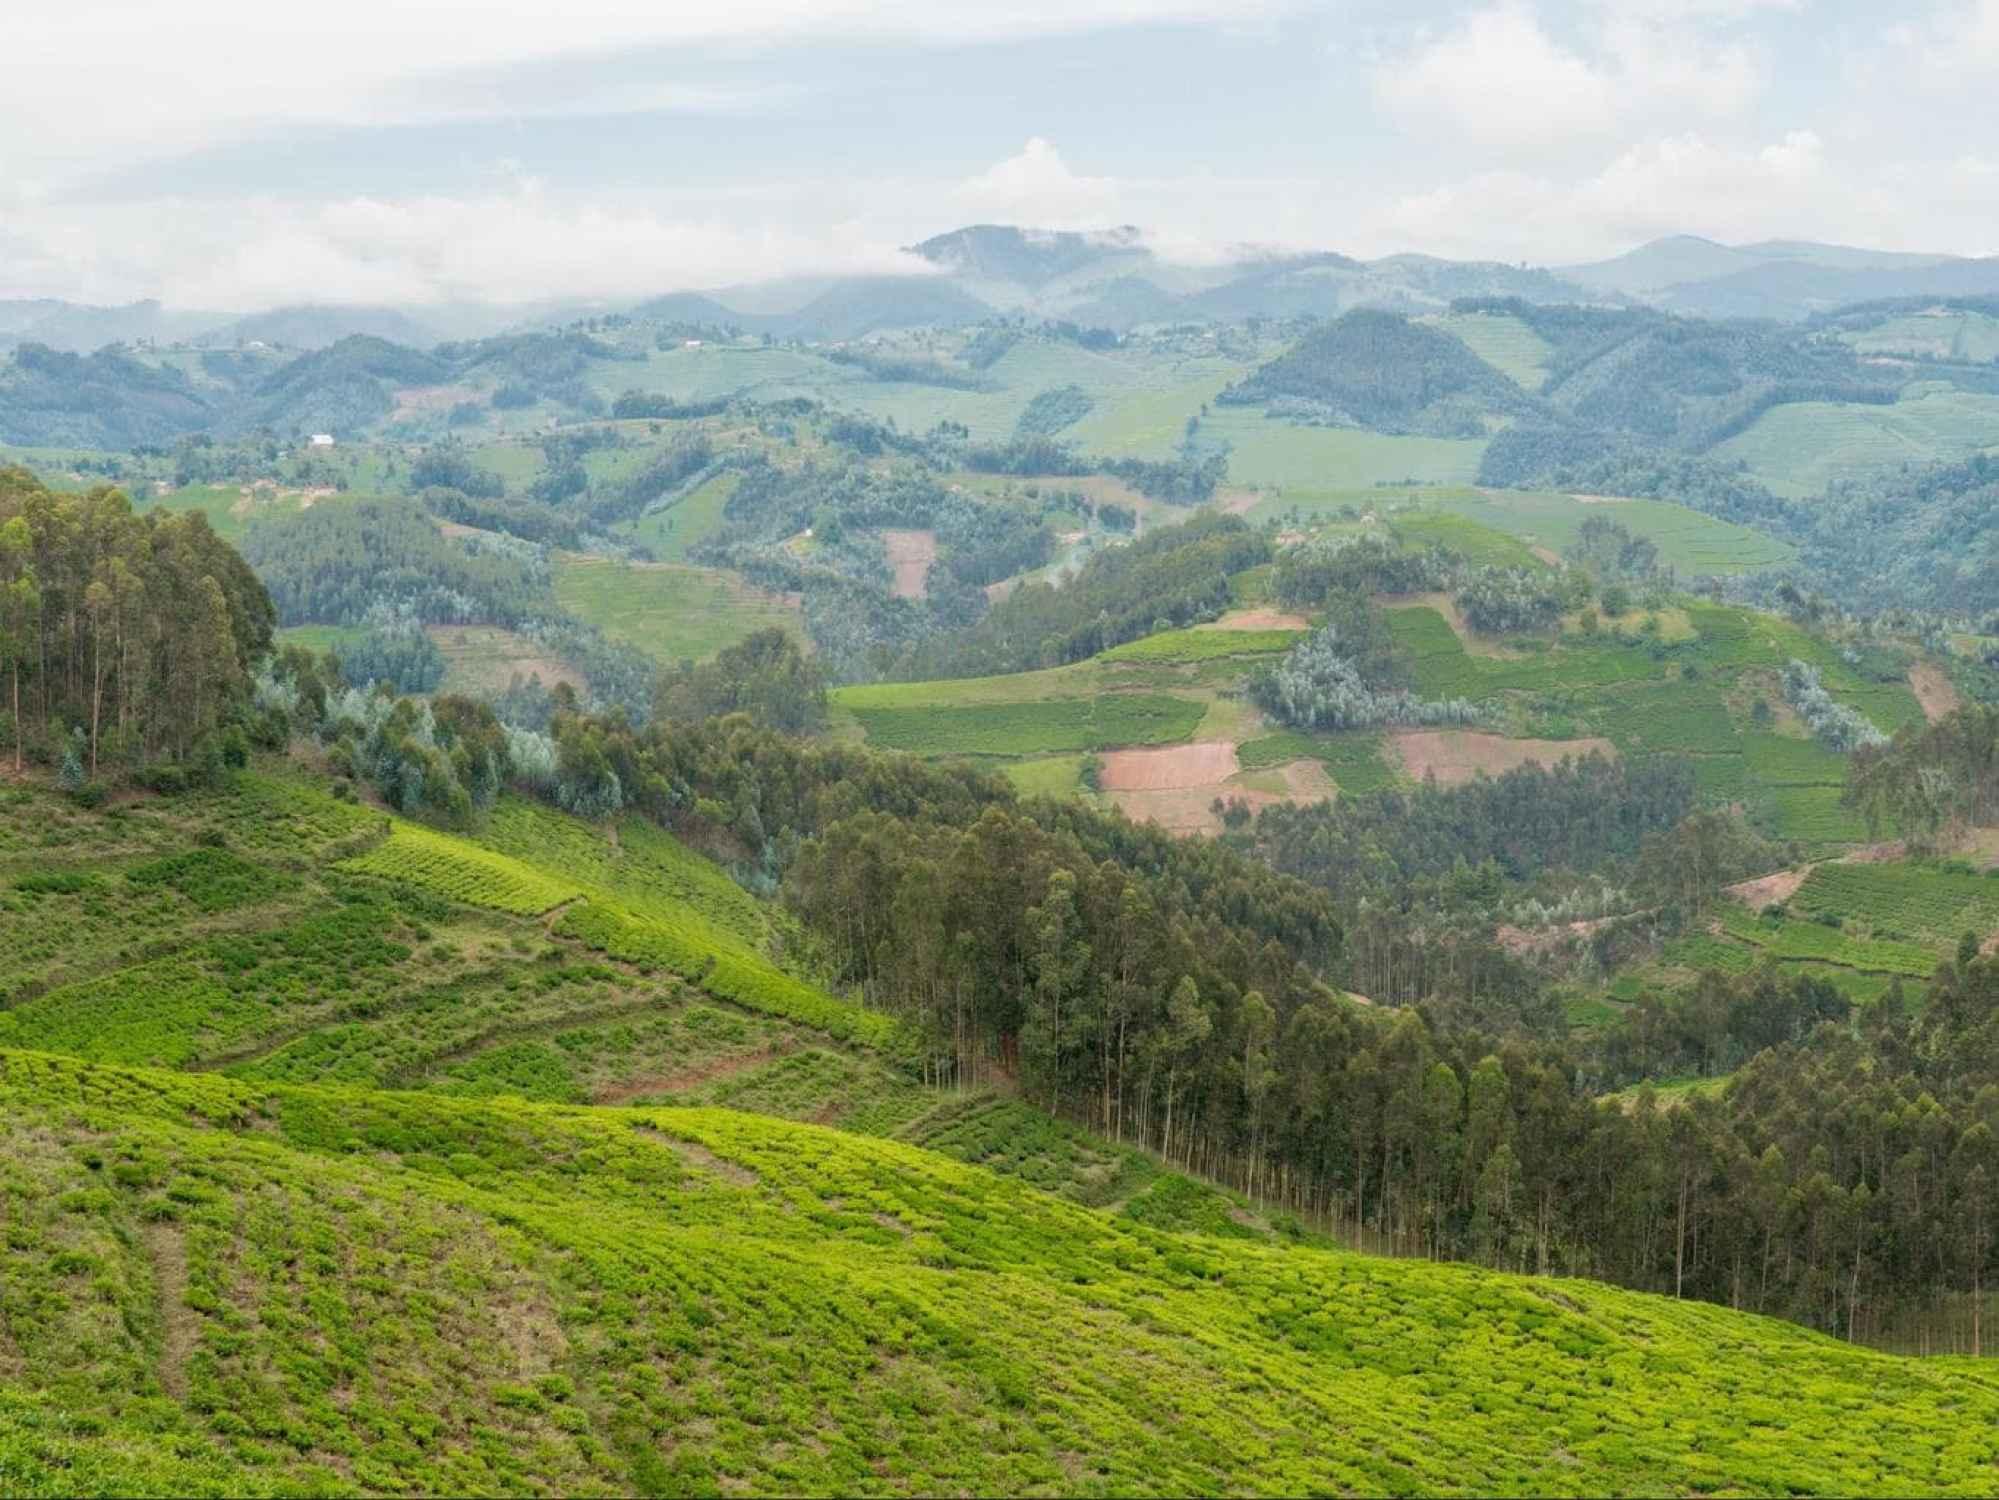 The landscapes near Gishwati Forest